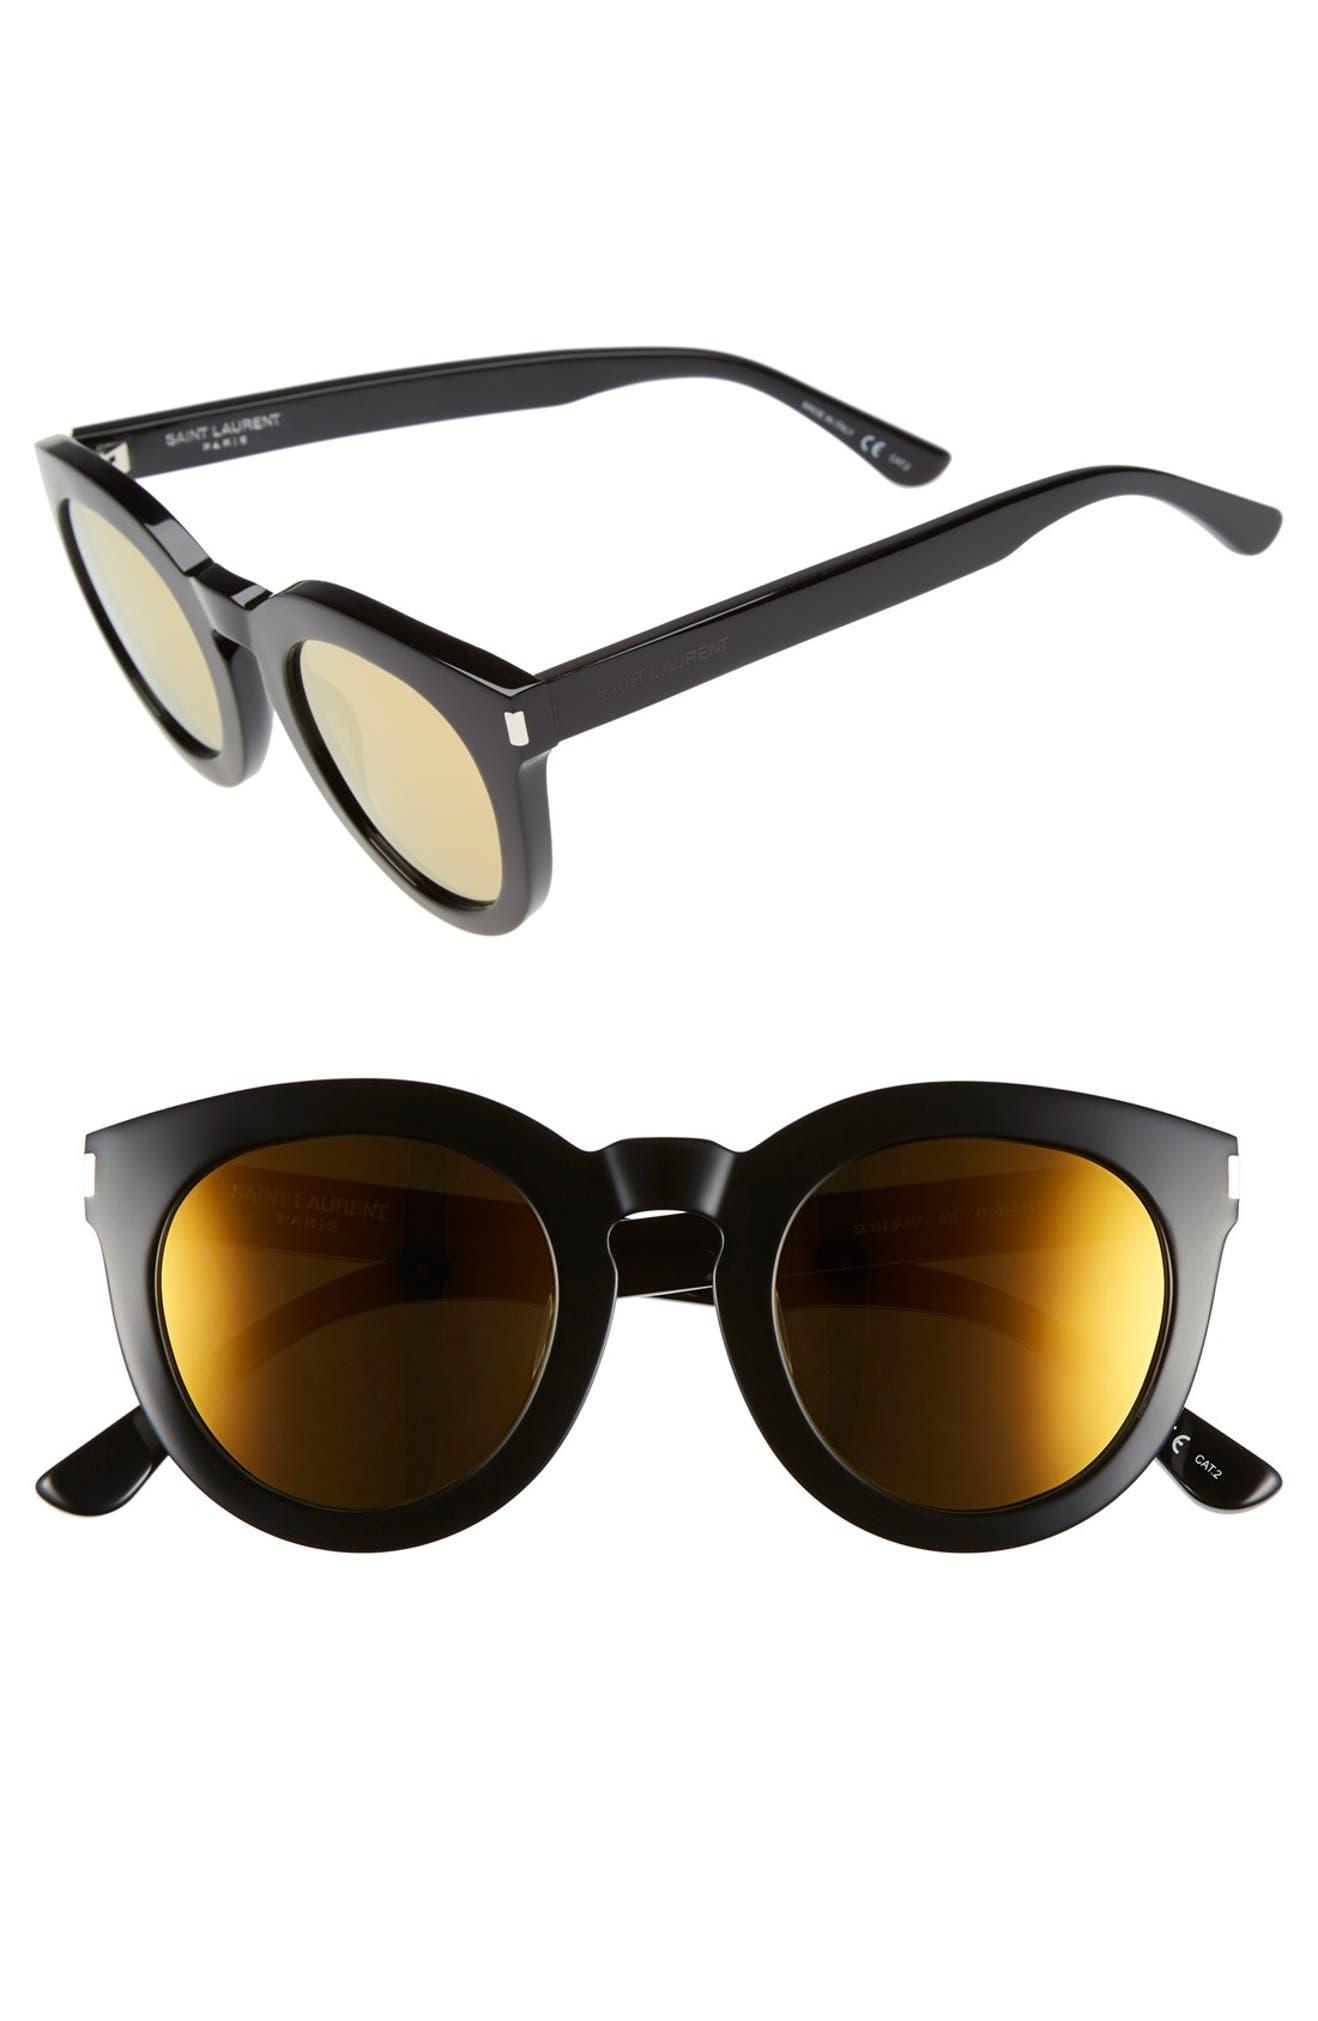 1fdf4faa9bd Saint Laurent  102 Surf  47mm Retro Sunglasses